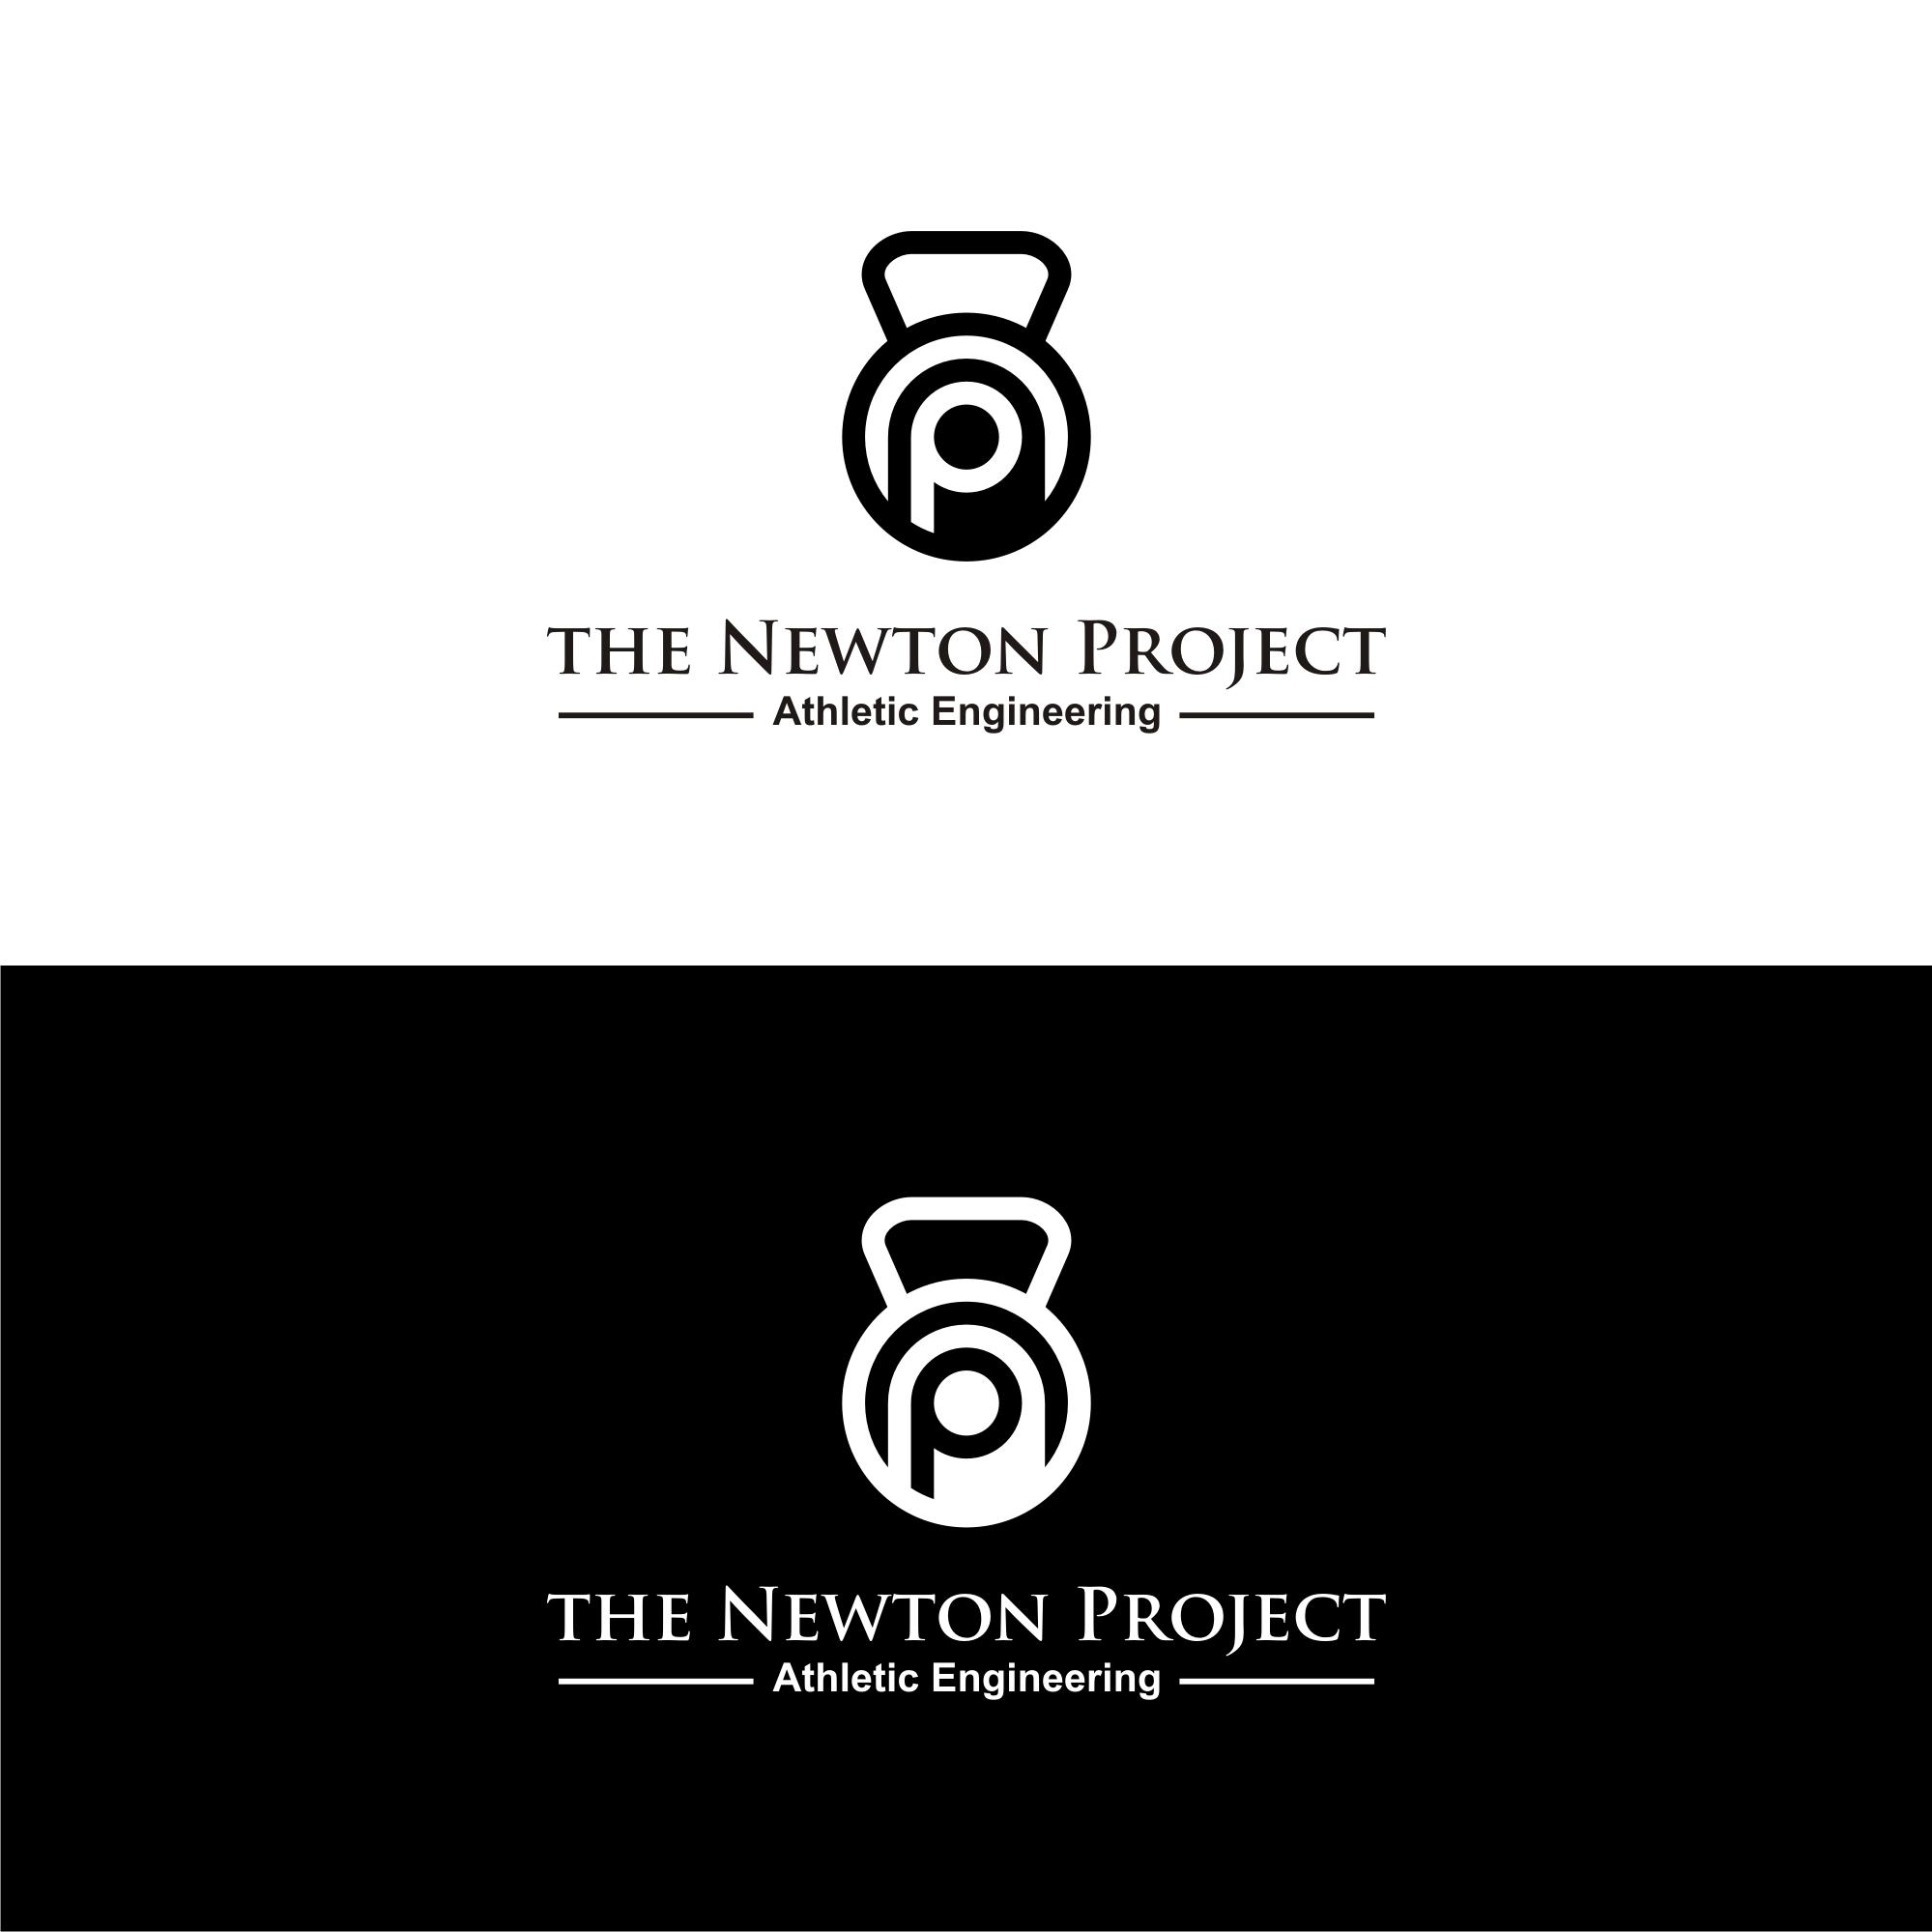 design #49 of Naya